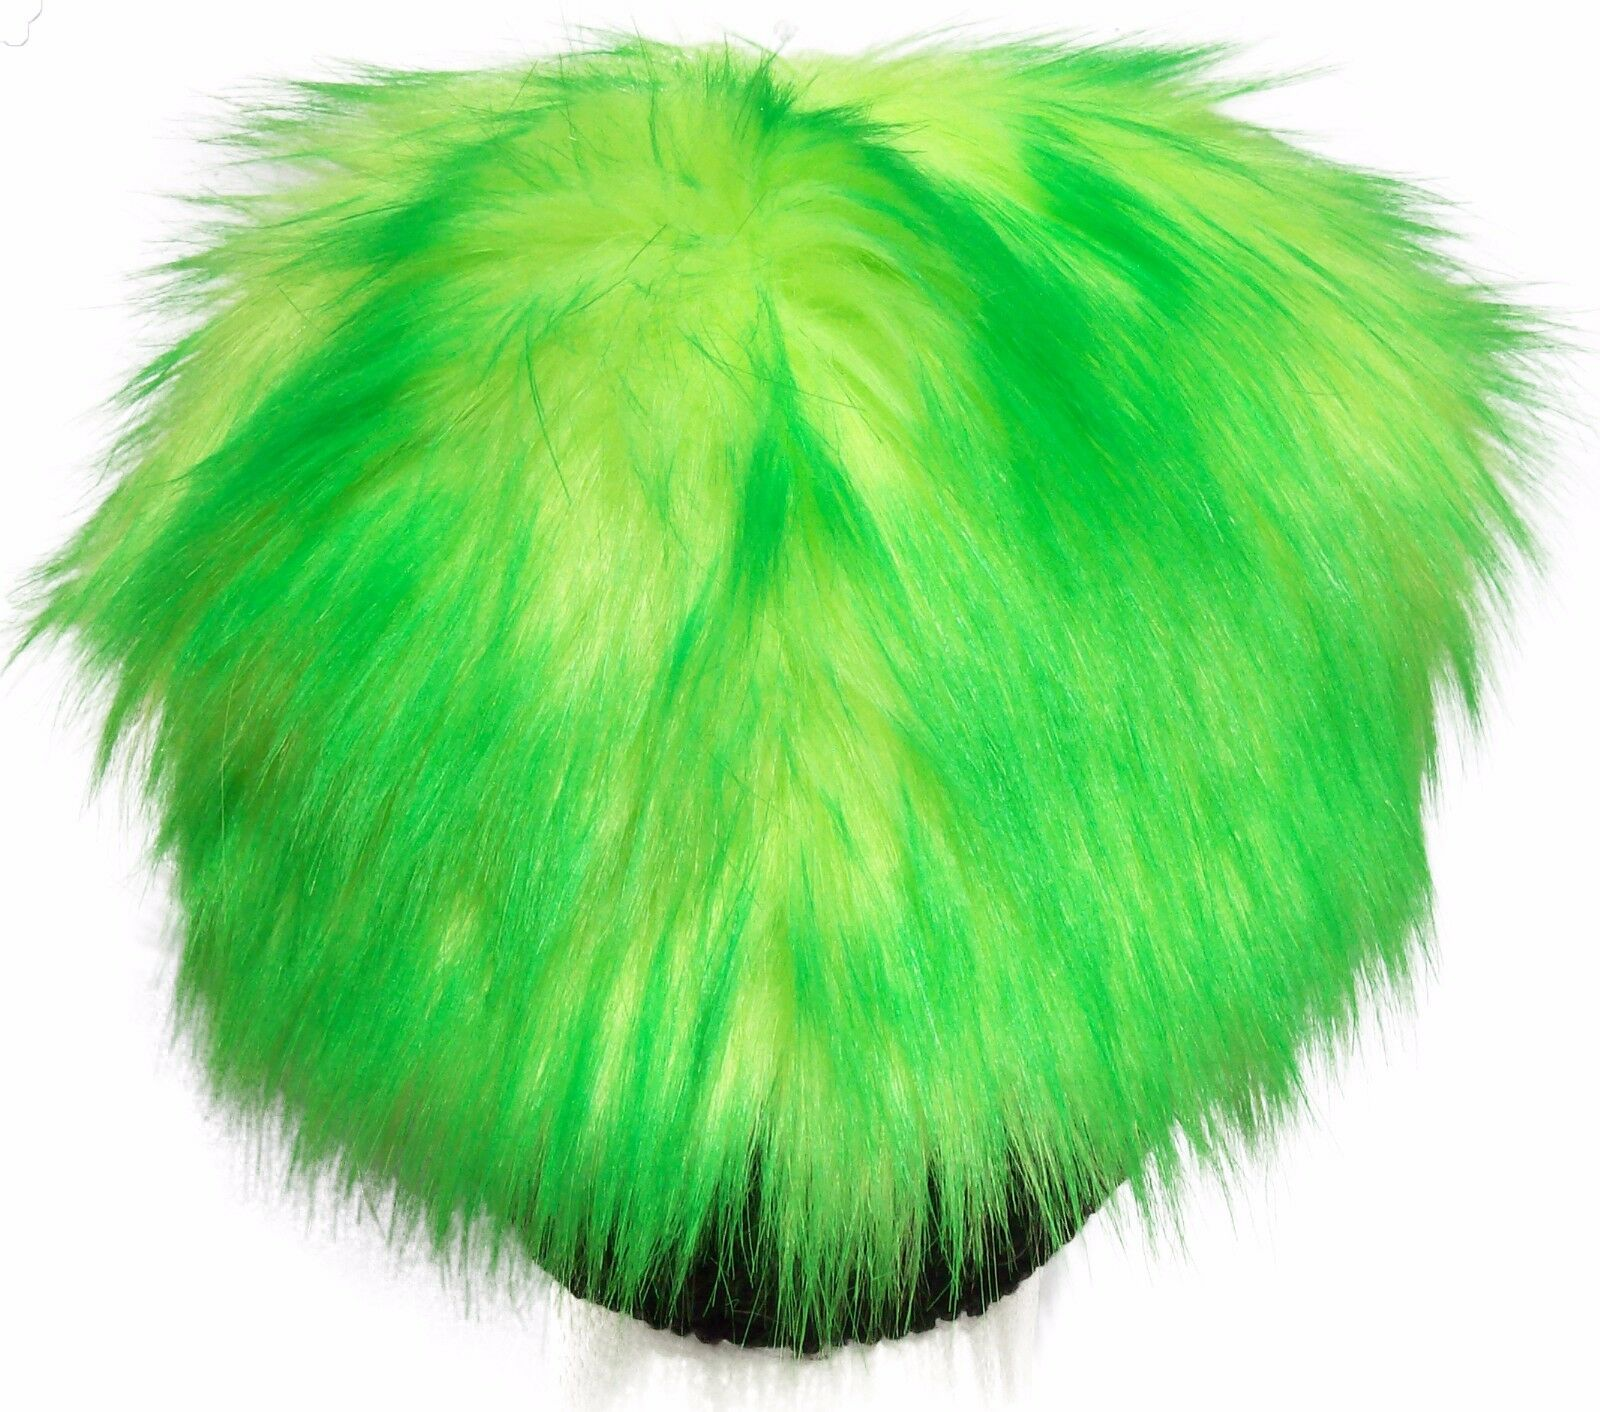 NEW- Sports EISBAR TRAPPER MU Funky Hair Merino Wool Winter Sports NEW- Ski Hat | Unisex ad6489